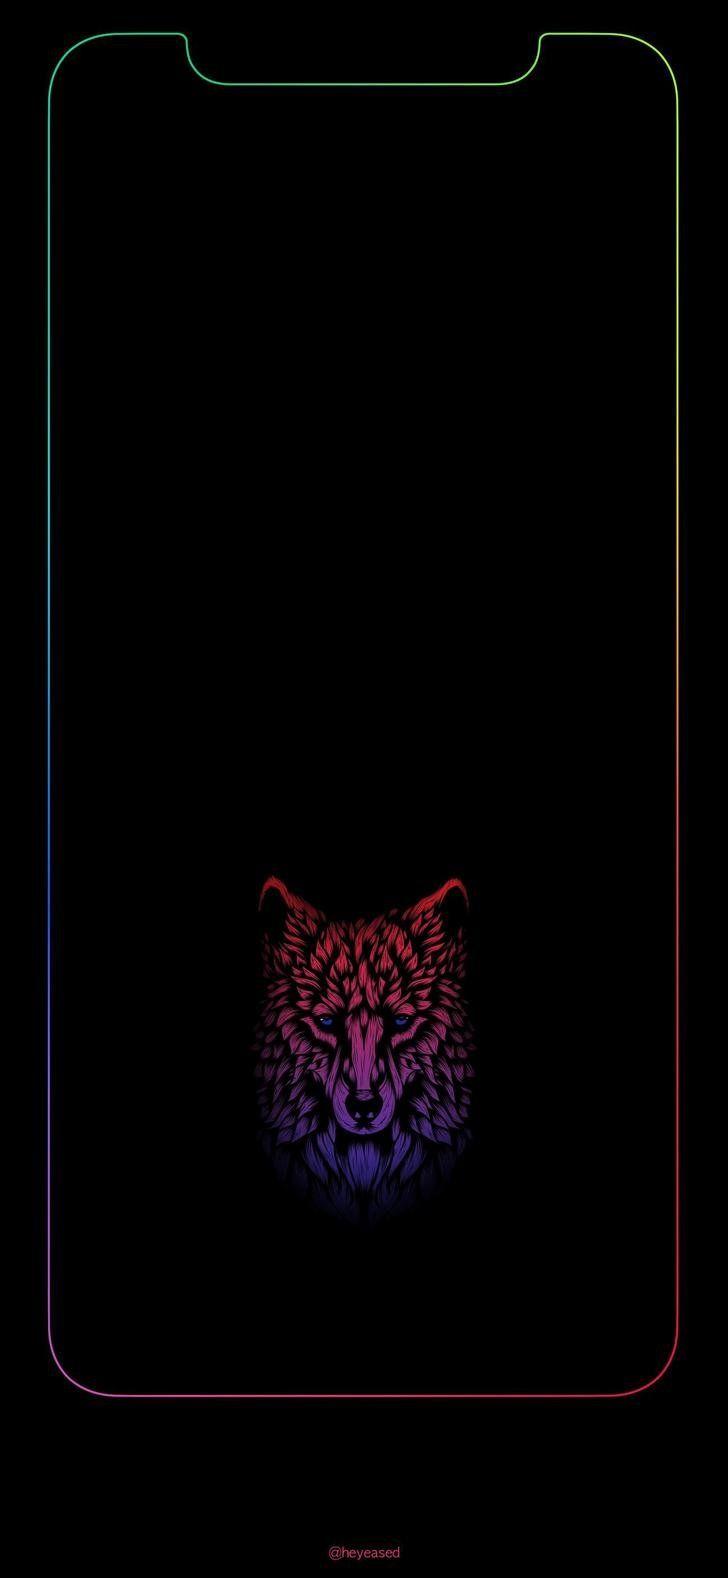 Border iPhone 11 Pro Max Wallpapers - Wallpaper Cave